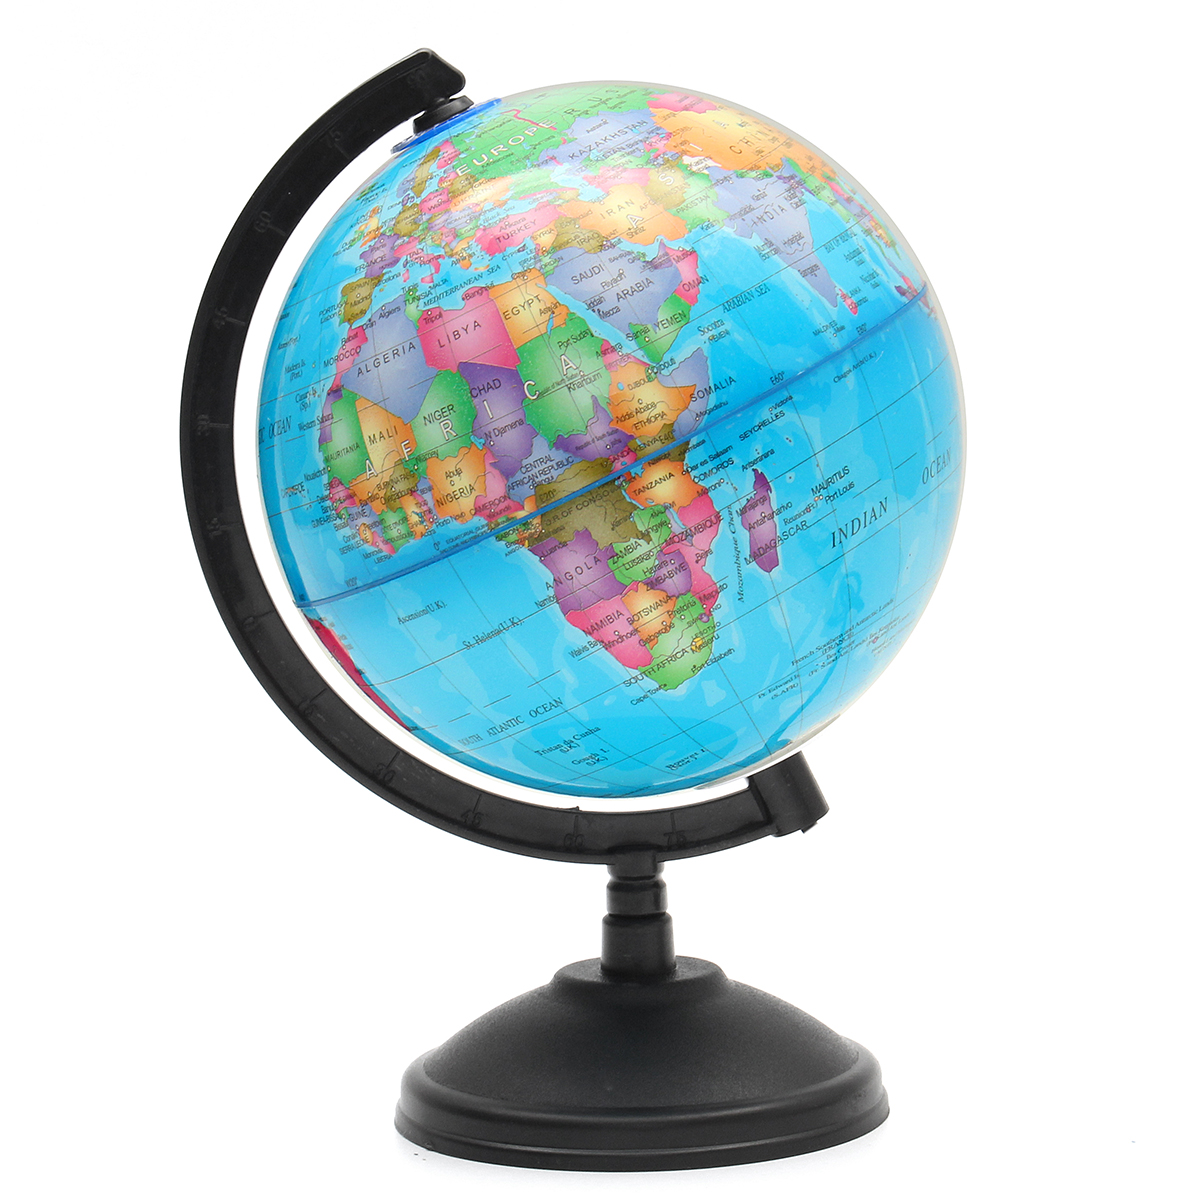 Atlas Globe Map.World Earth Globe Atlas Map Geography Education Gift W Rotating